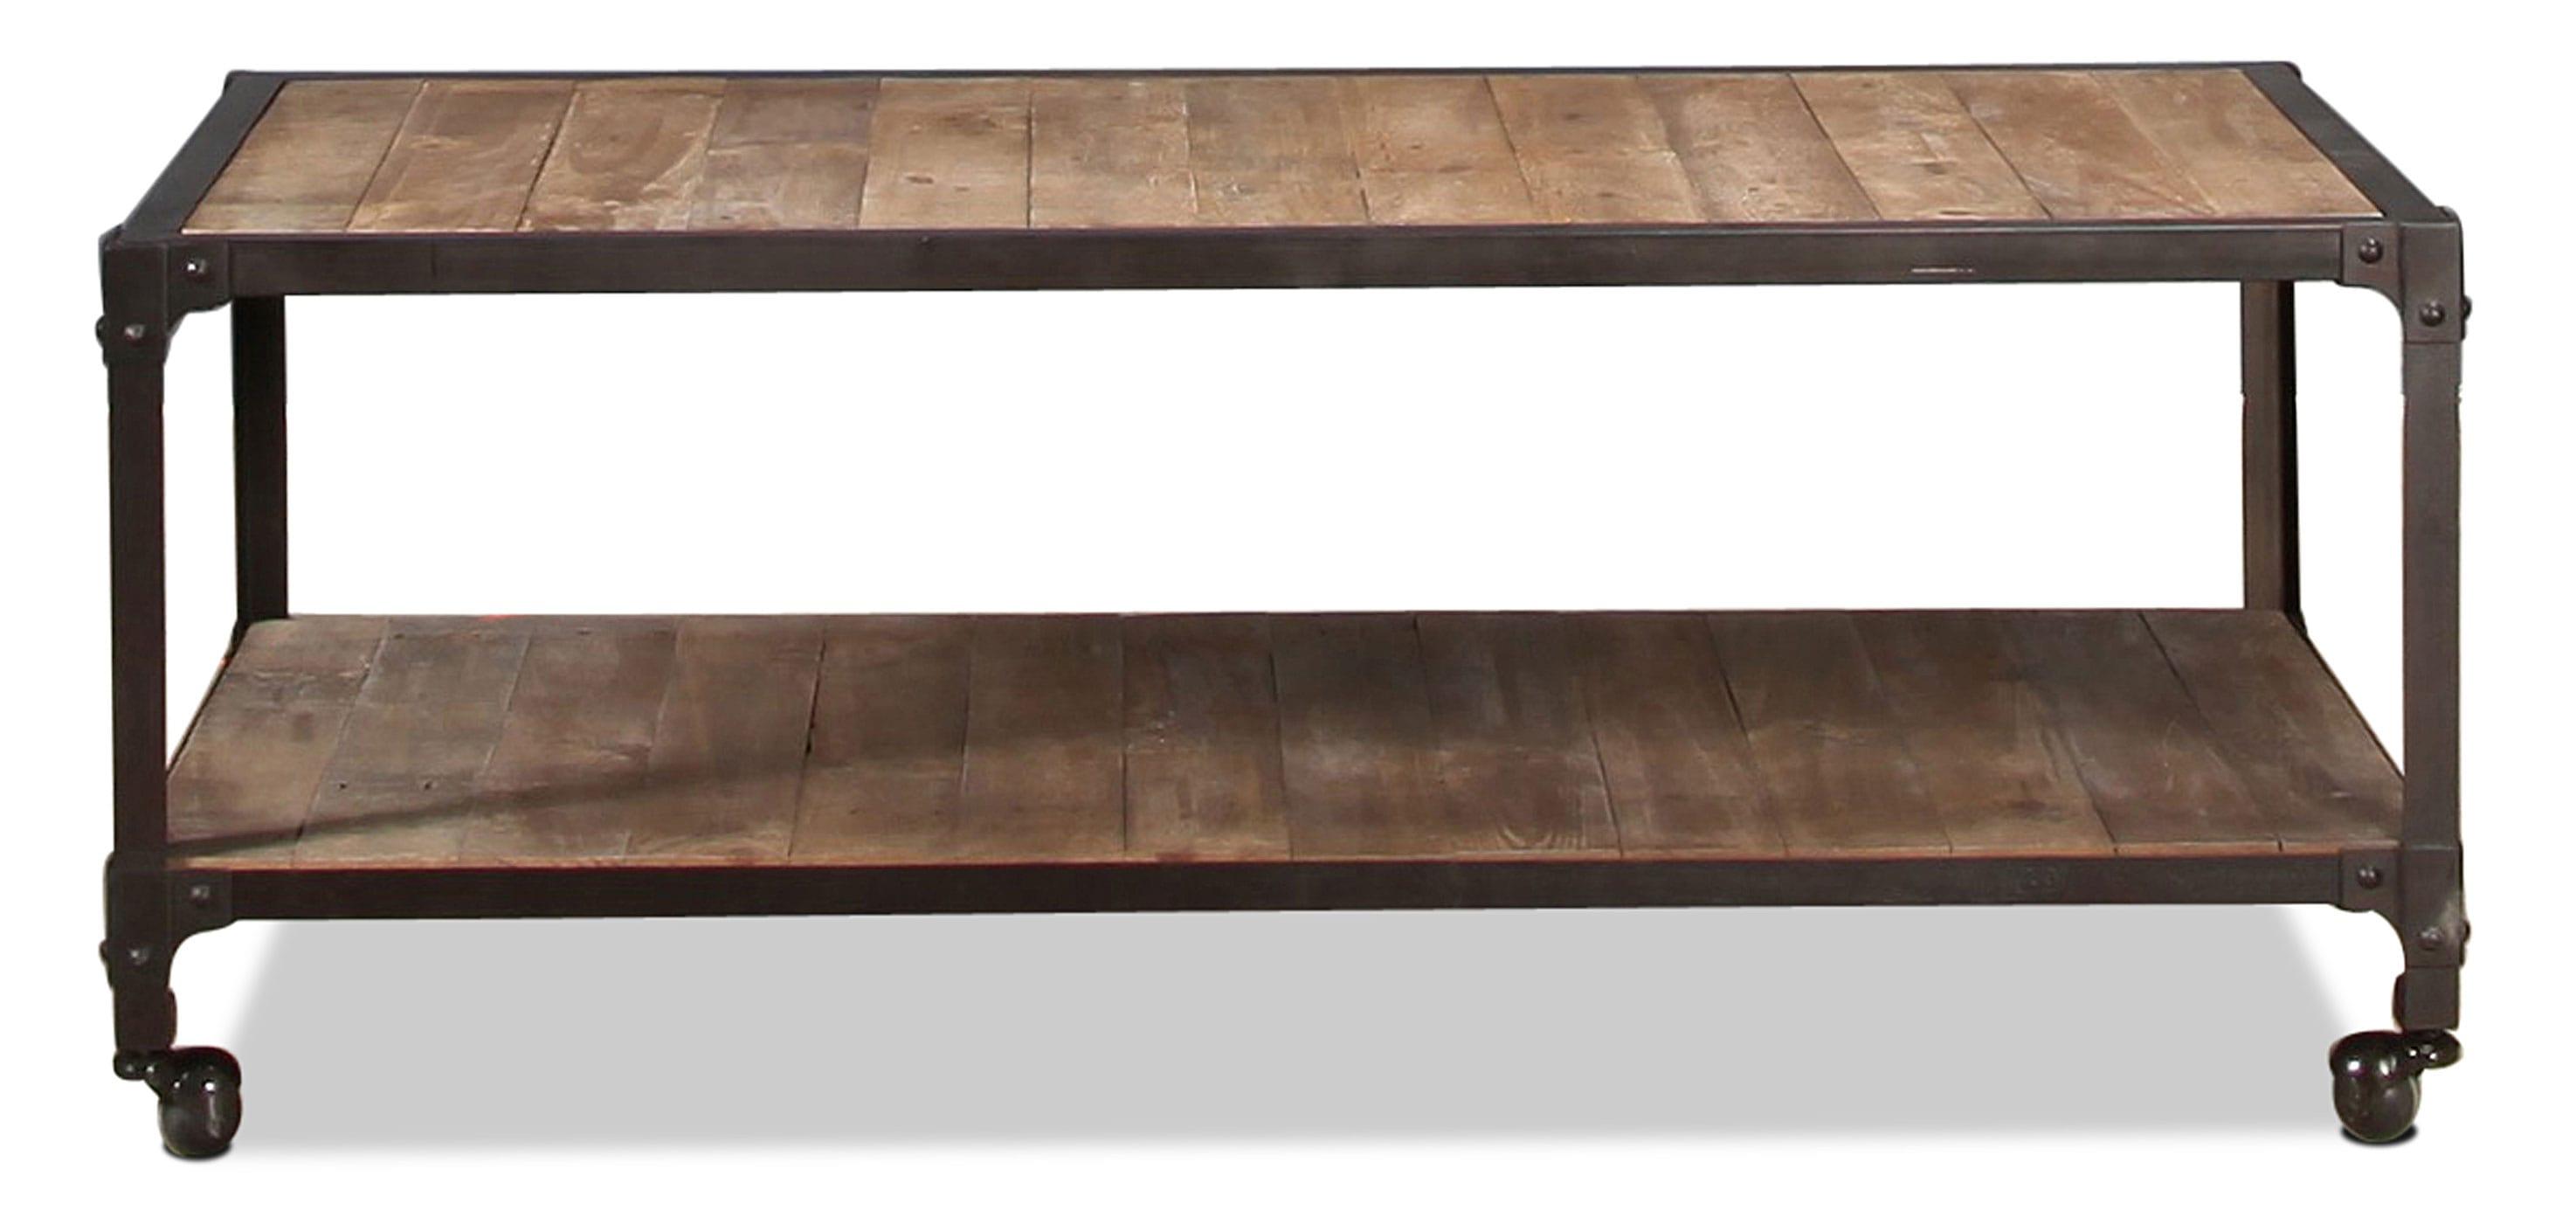 Thomsen Coffee Table - Reclaimed Pine